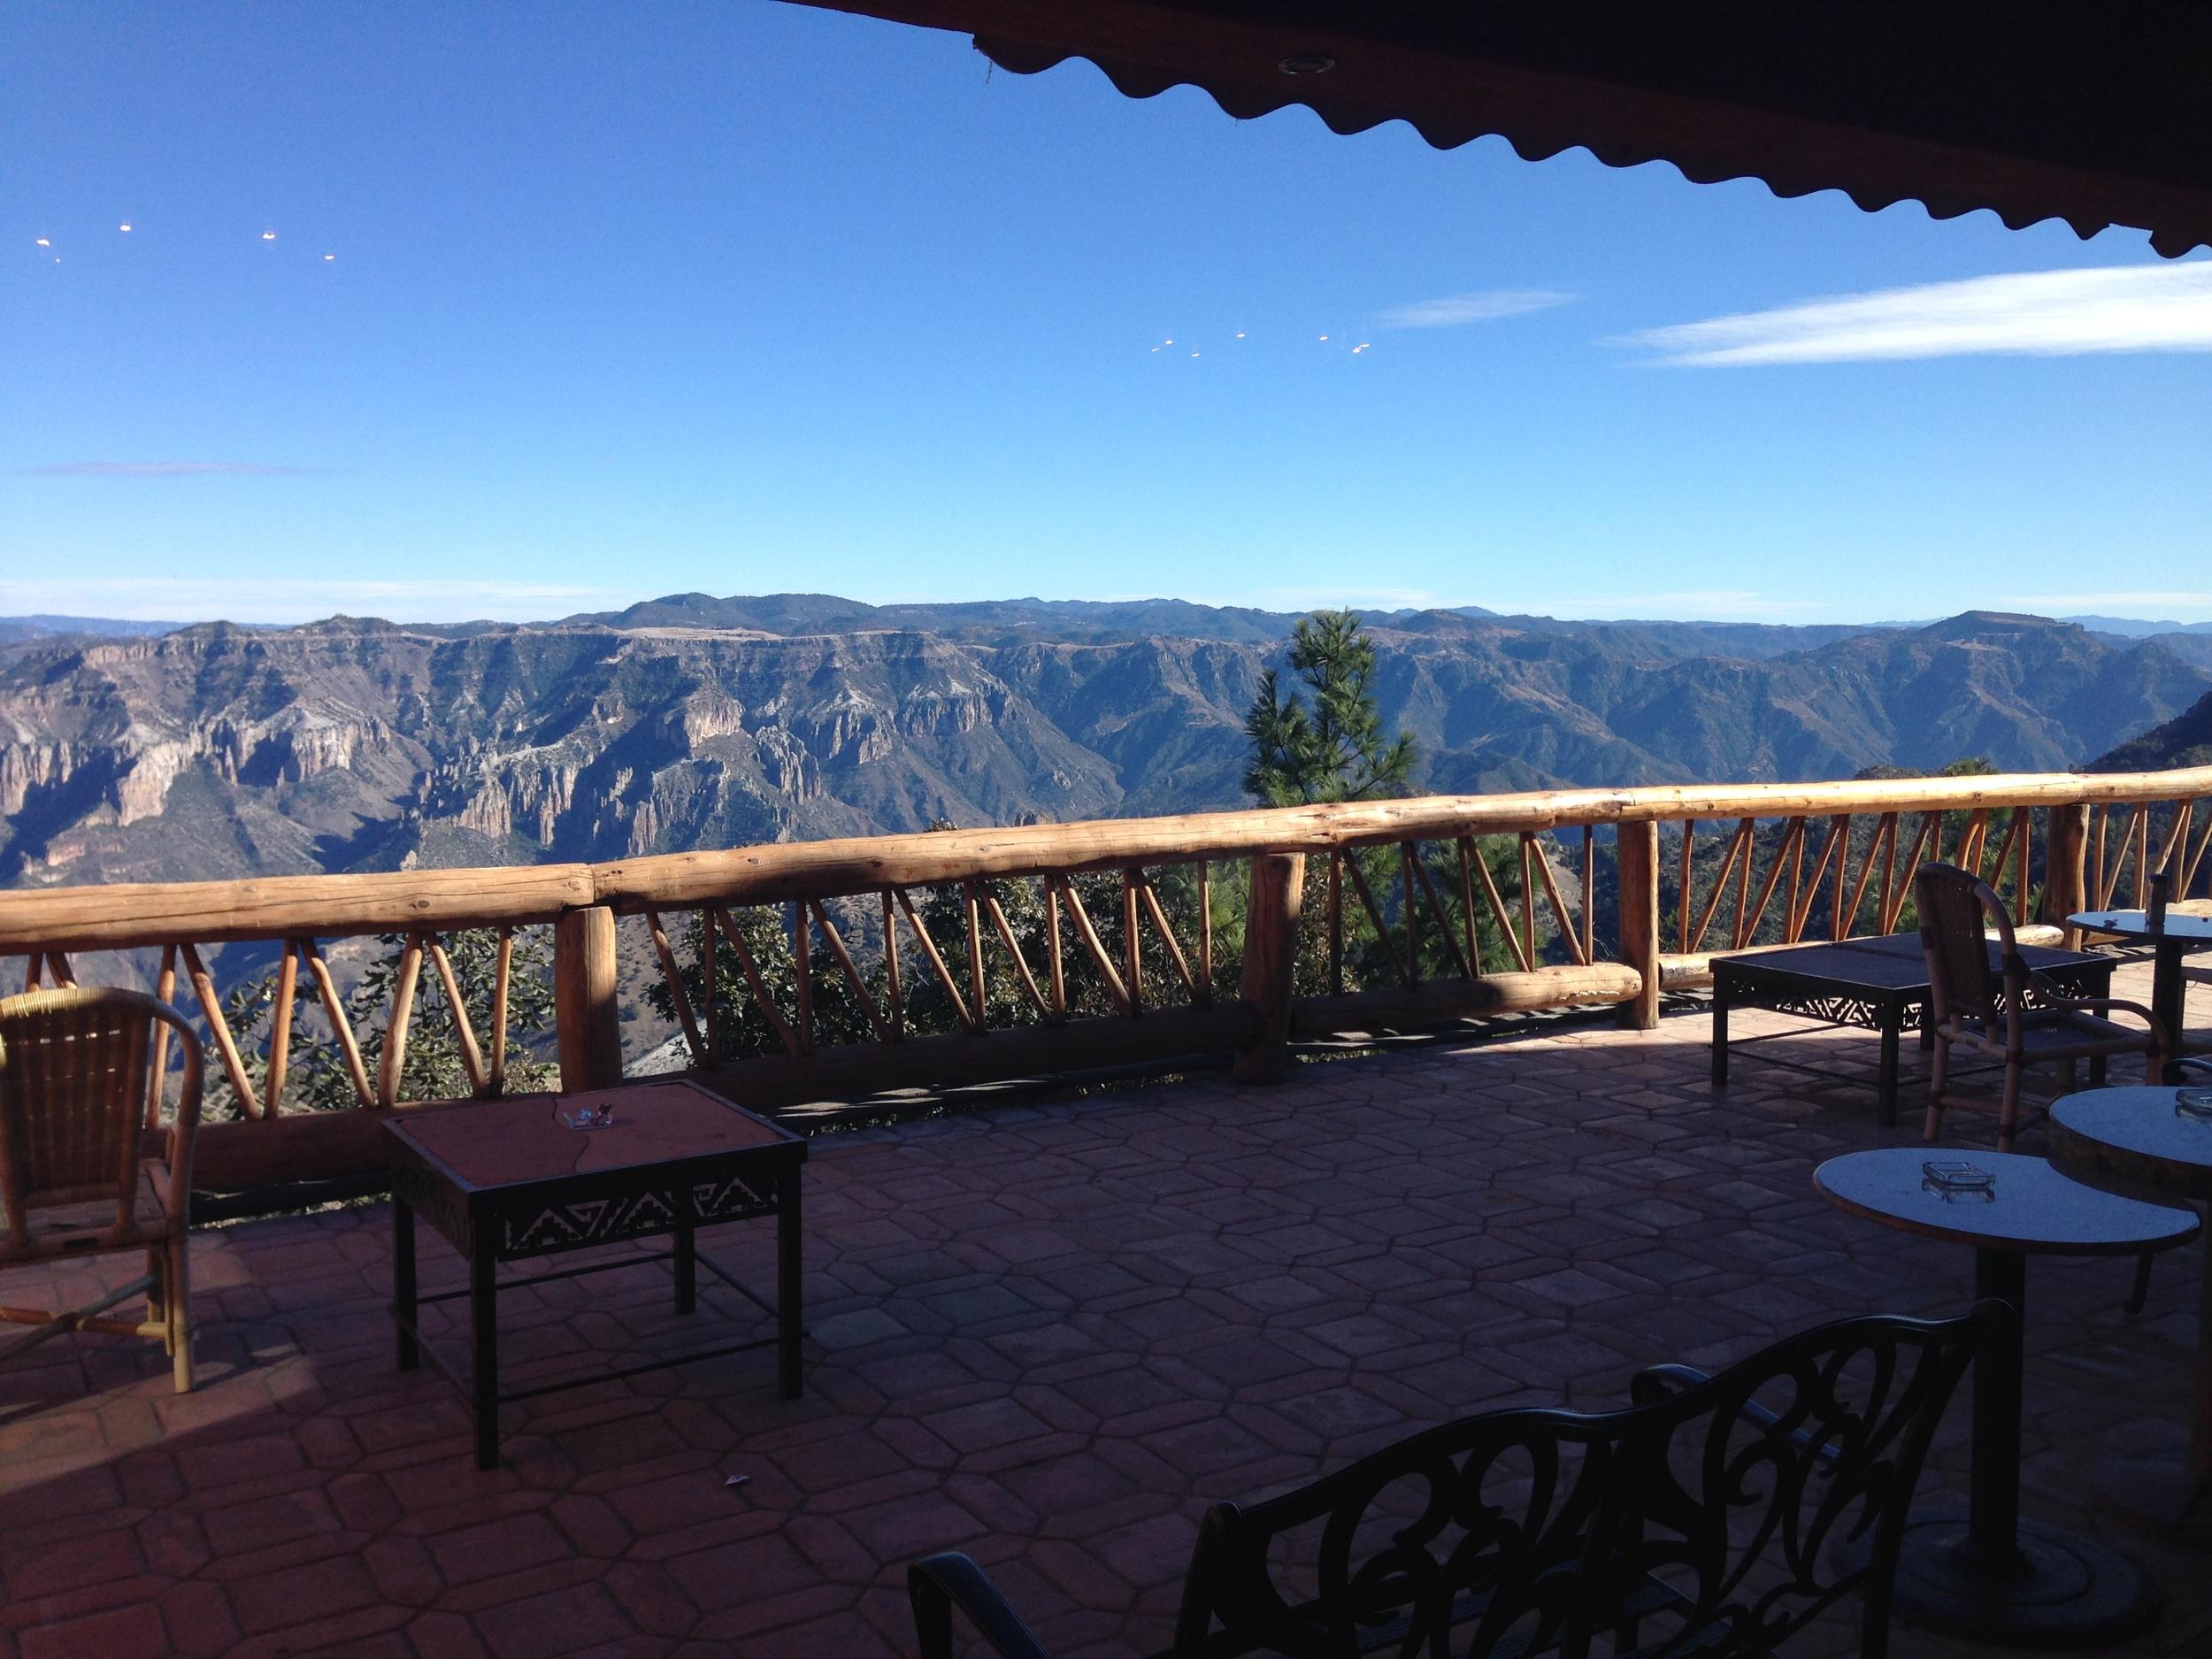 Pasada Mirador Hotel at the rim of Copper Canyon, MX